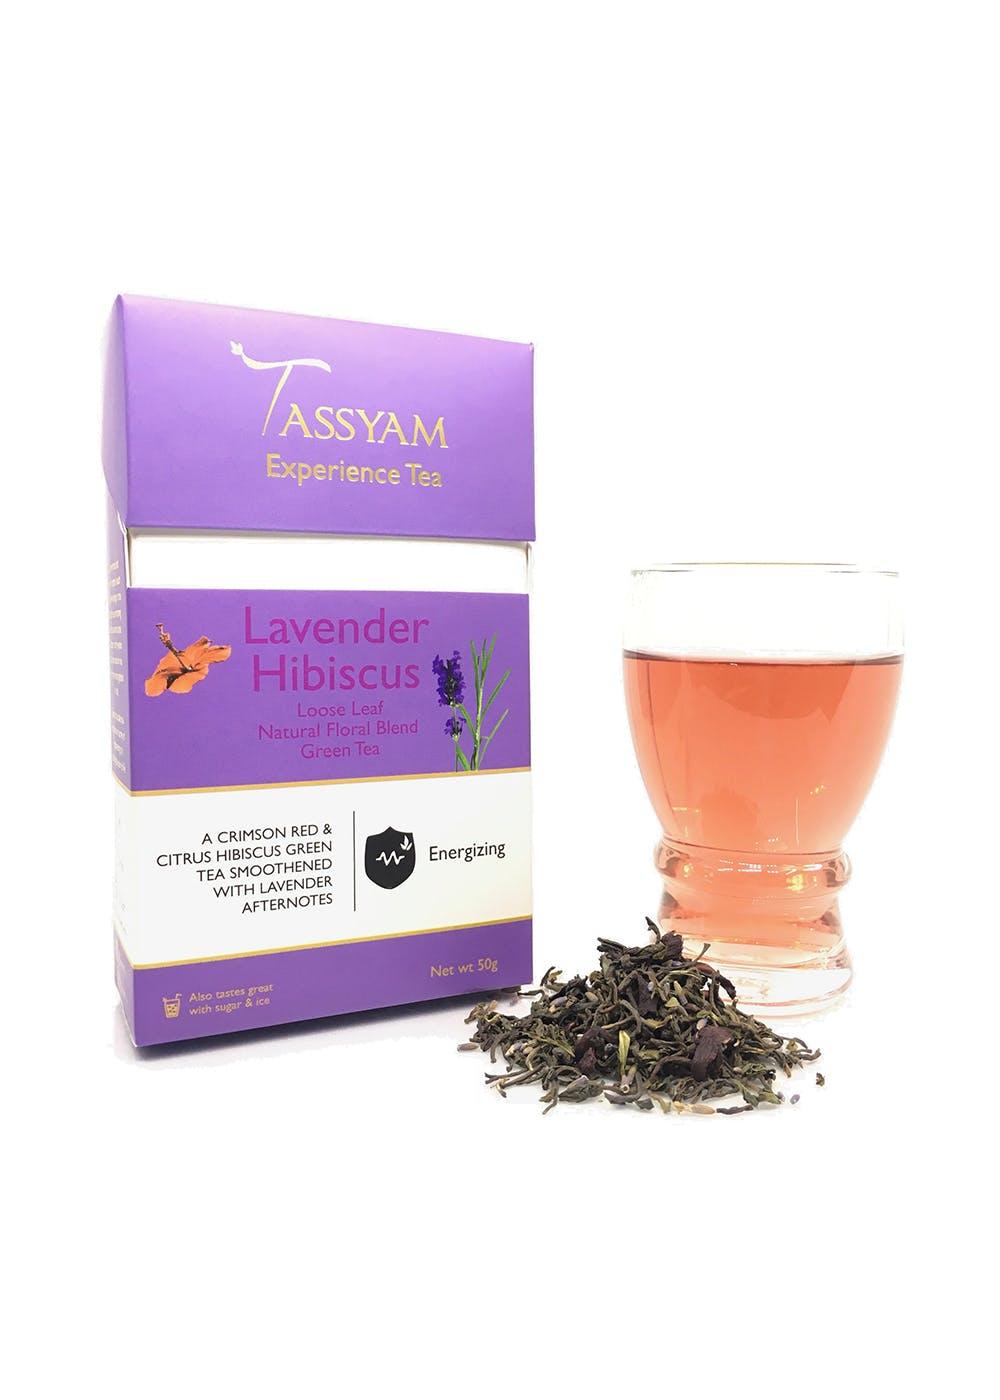 Lavender Hibiscus Green Tea Darjeeling 50 grams